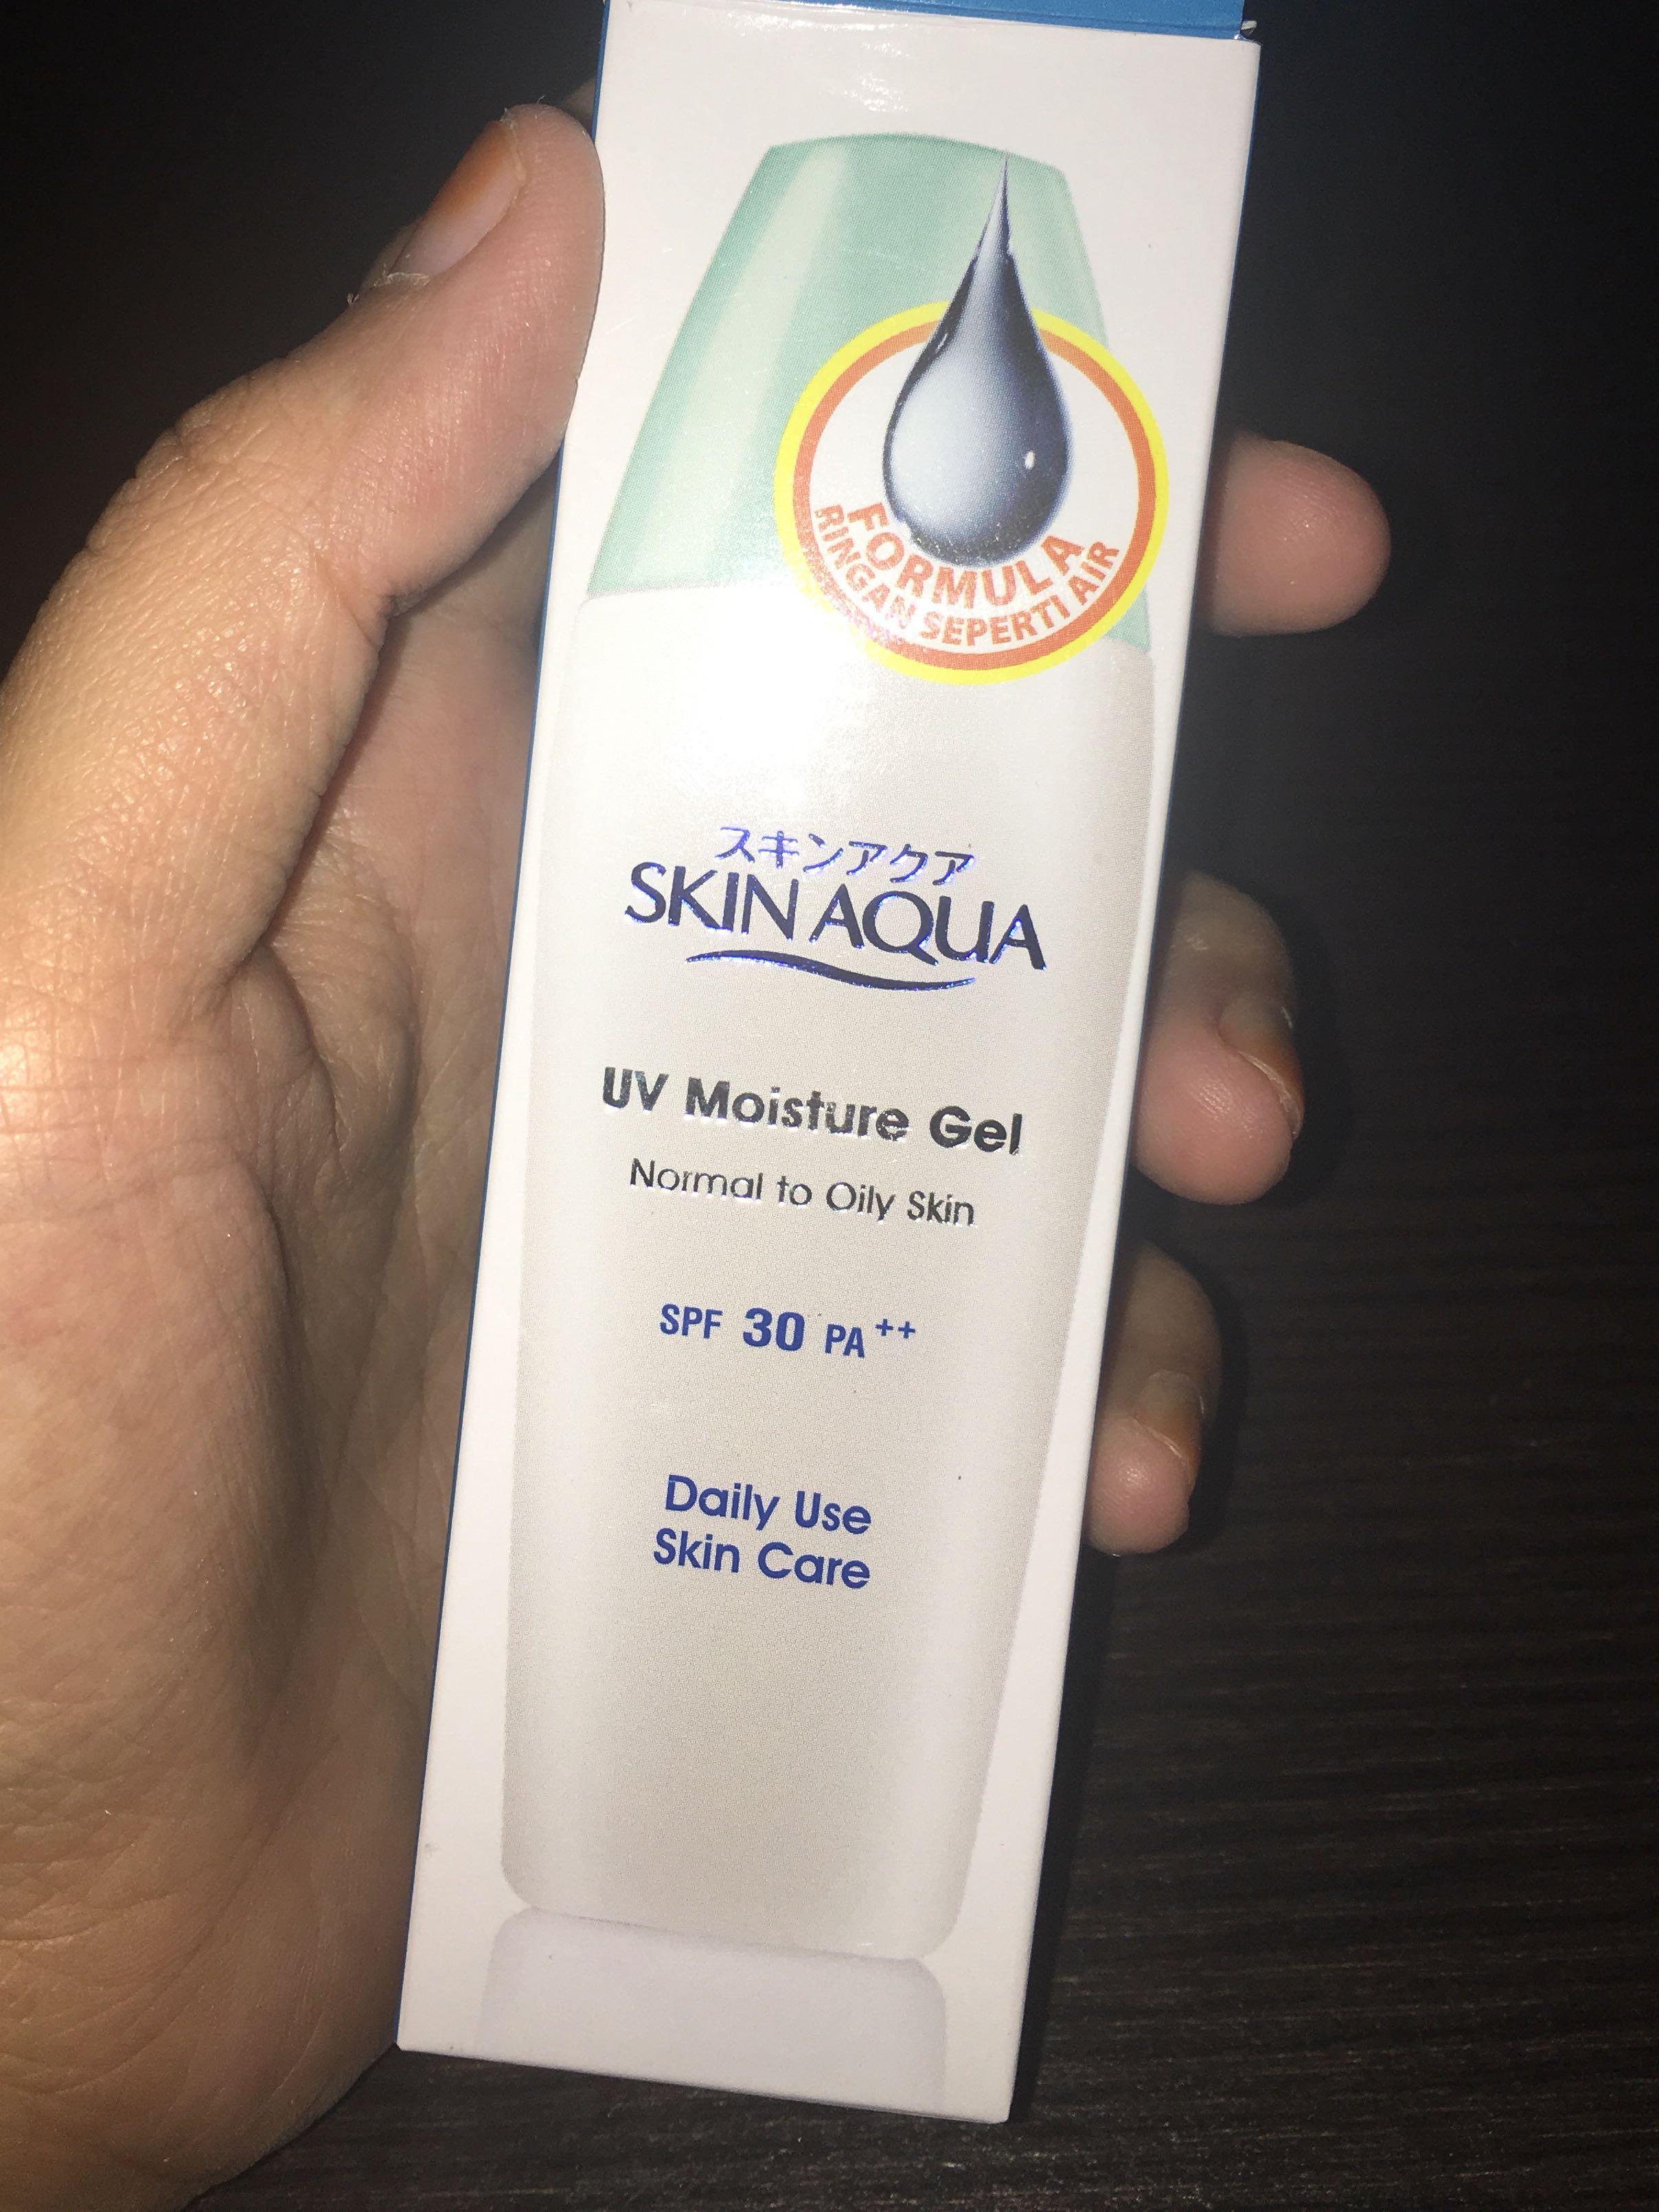 Pelembap Skin Aqua uv moisture gel